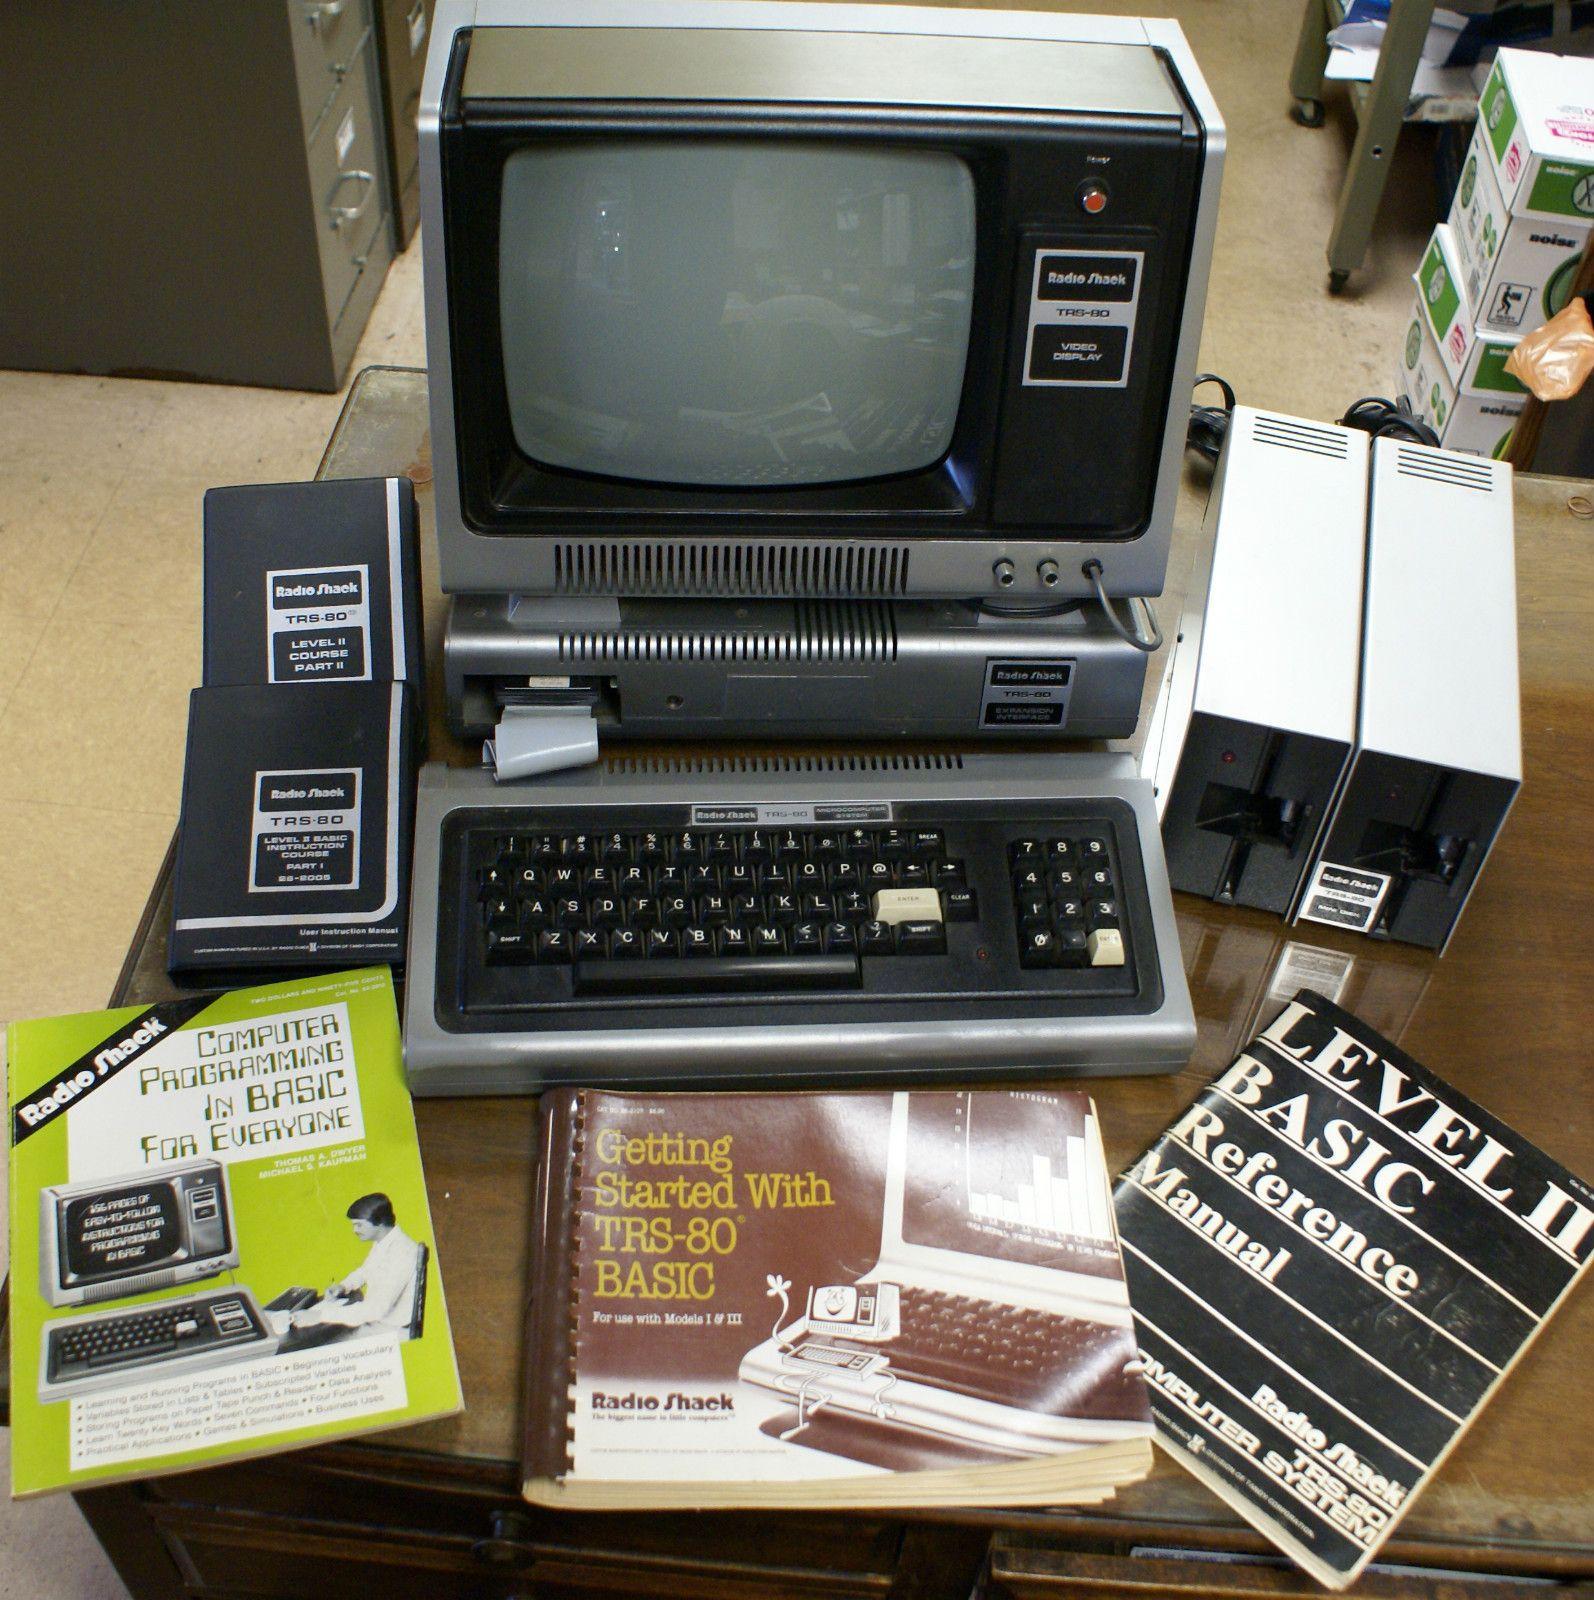 Computers Technology: Radio Shack TRS-80 Model 1 (1977-1980)